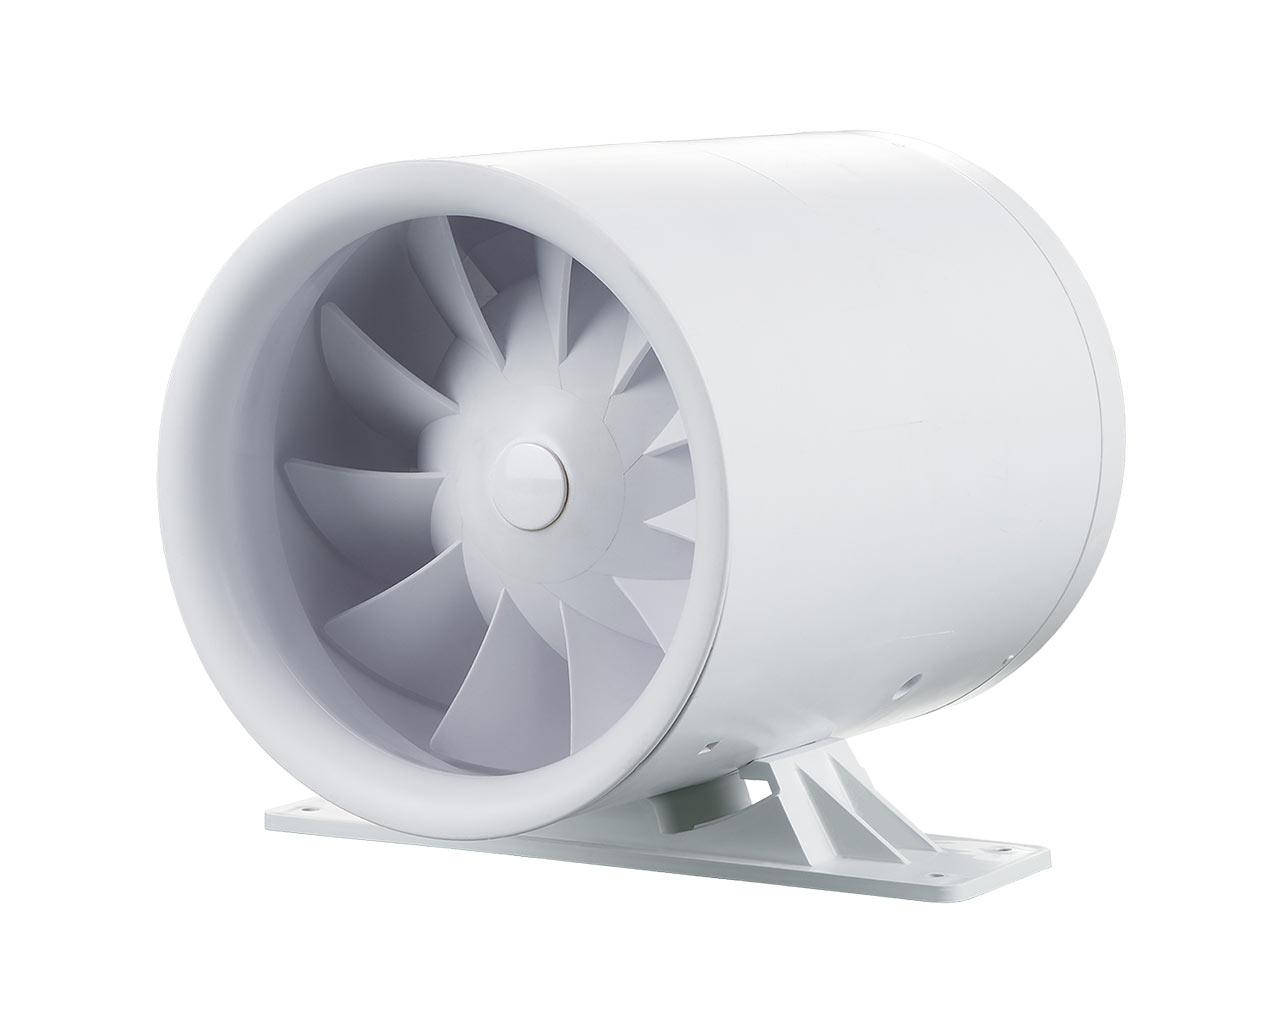 SIKU 125 Turbine-k Duo